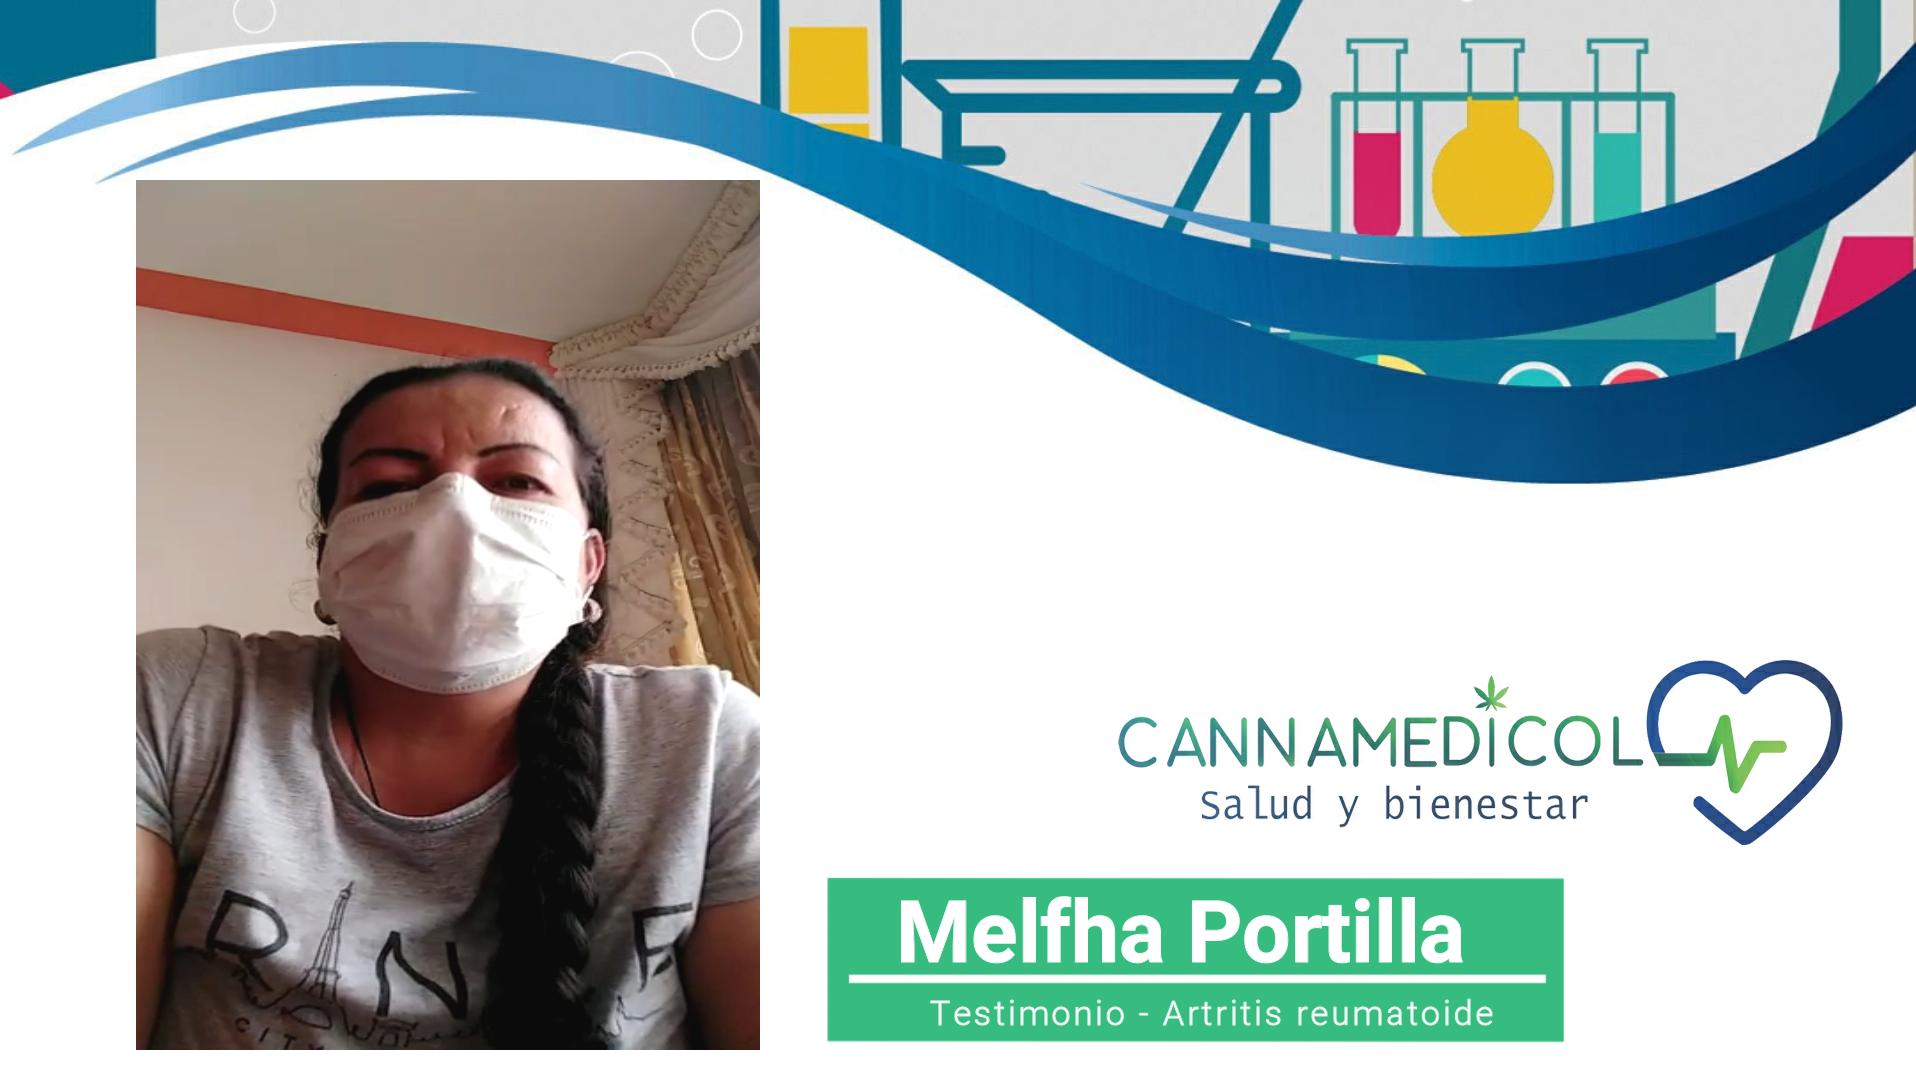 Testimonio de Artritis reumatoide – Melfha Portilla post thumbnail